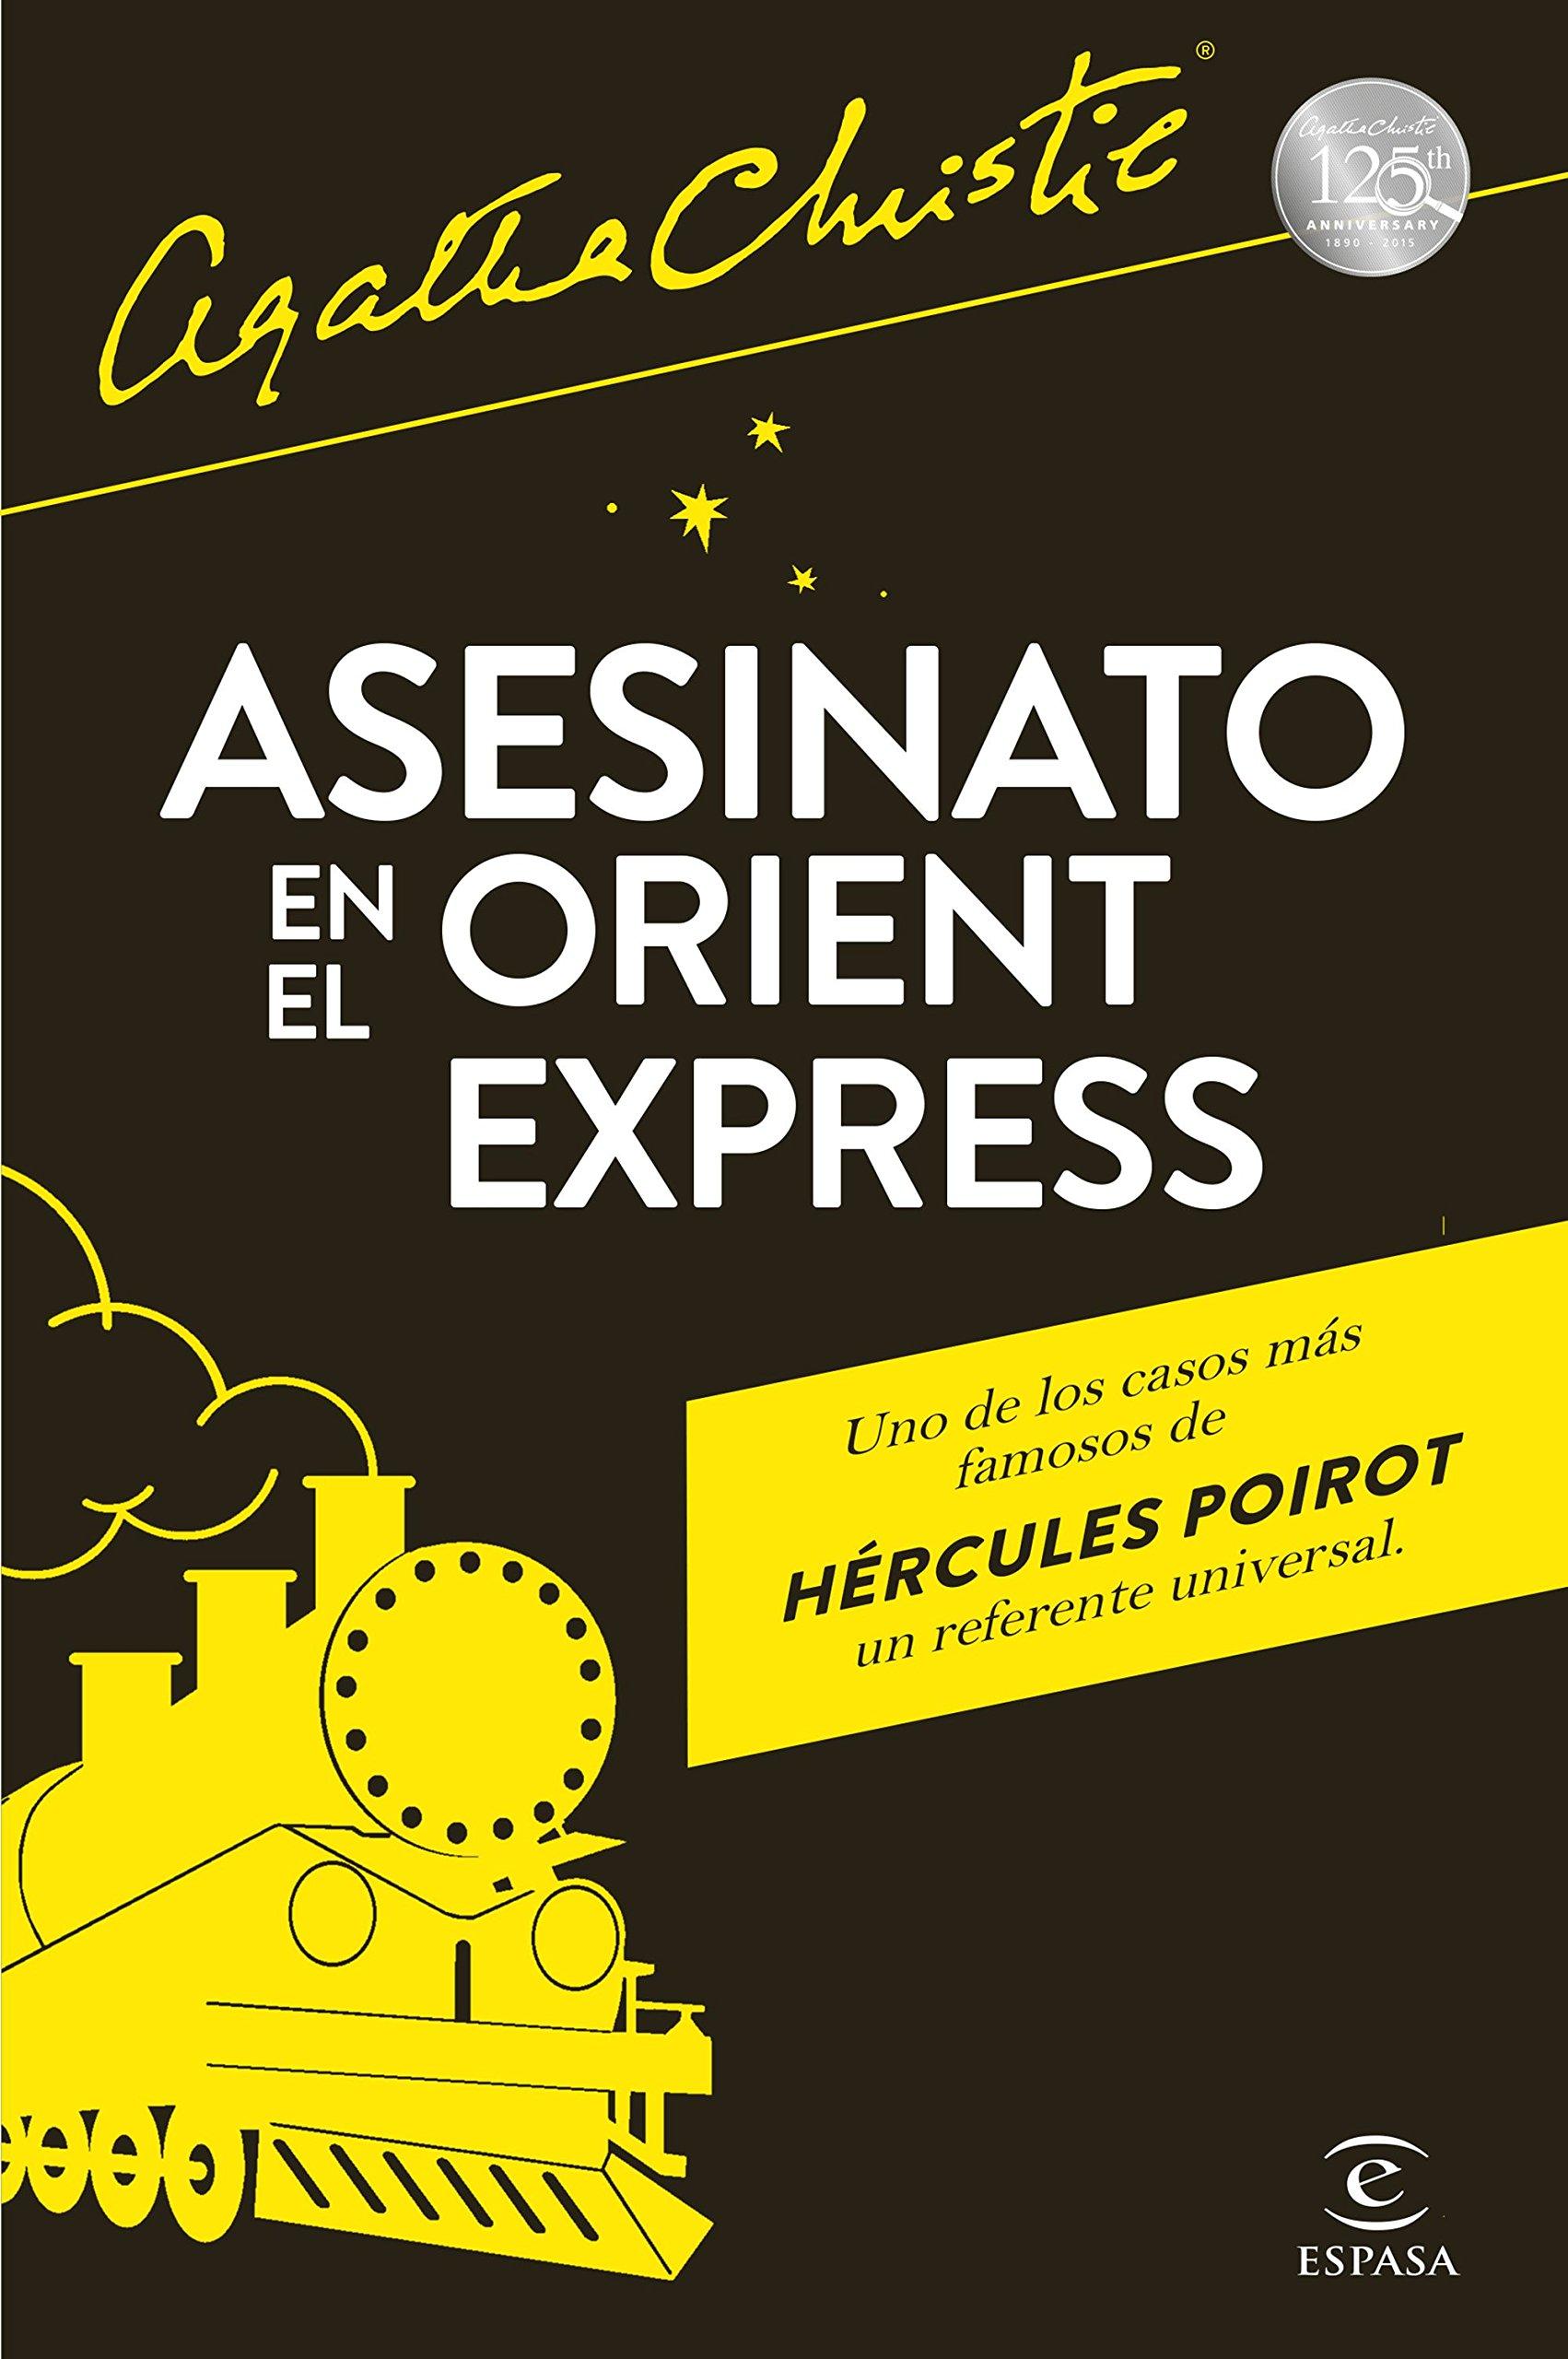 Asesinato en el Orient Express (Espasa Narrativa): Amazon.es: Agatha  Christie, Eduardo Machado Quevedo: Libros